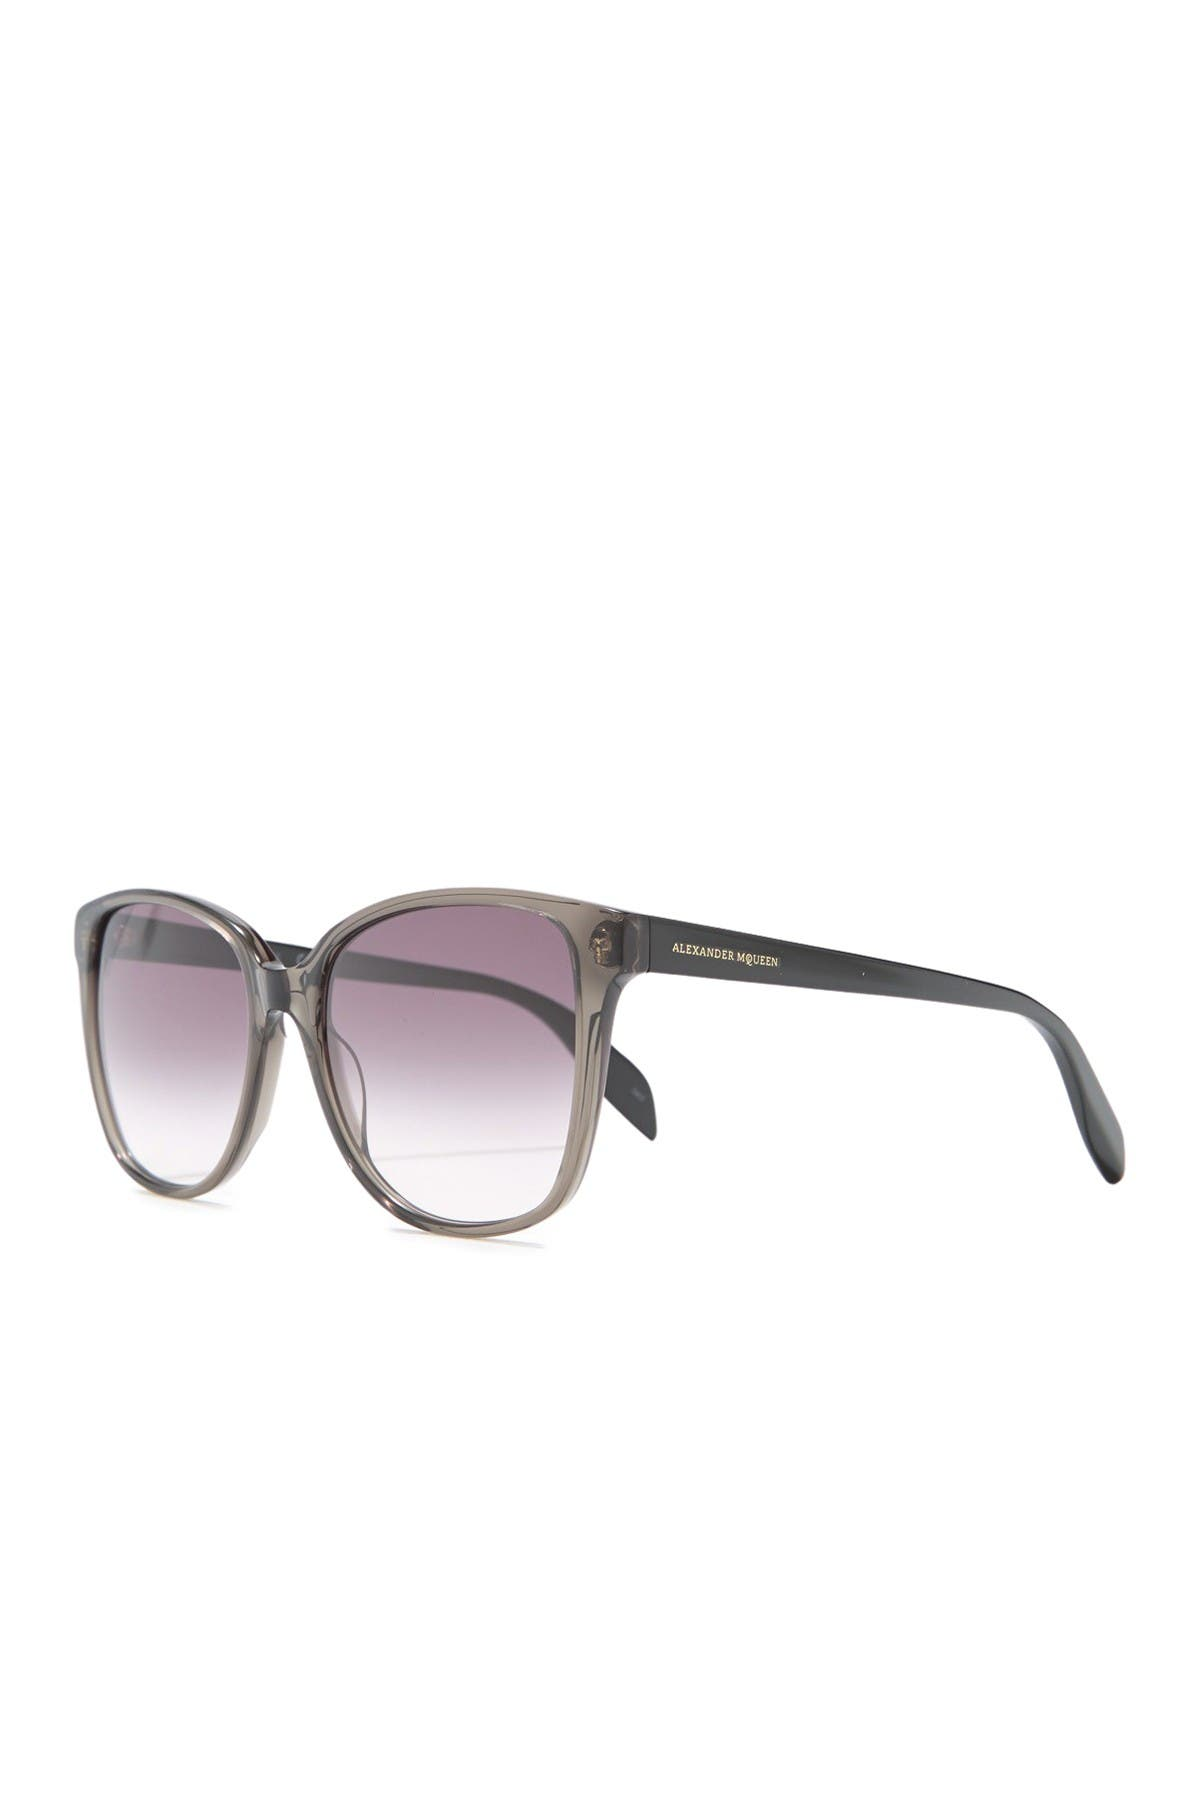 Image of Alexander McQueen 56mm Square Sunglasses